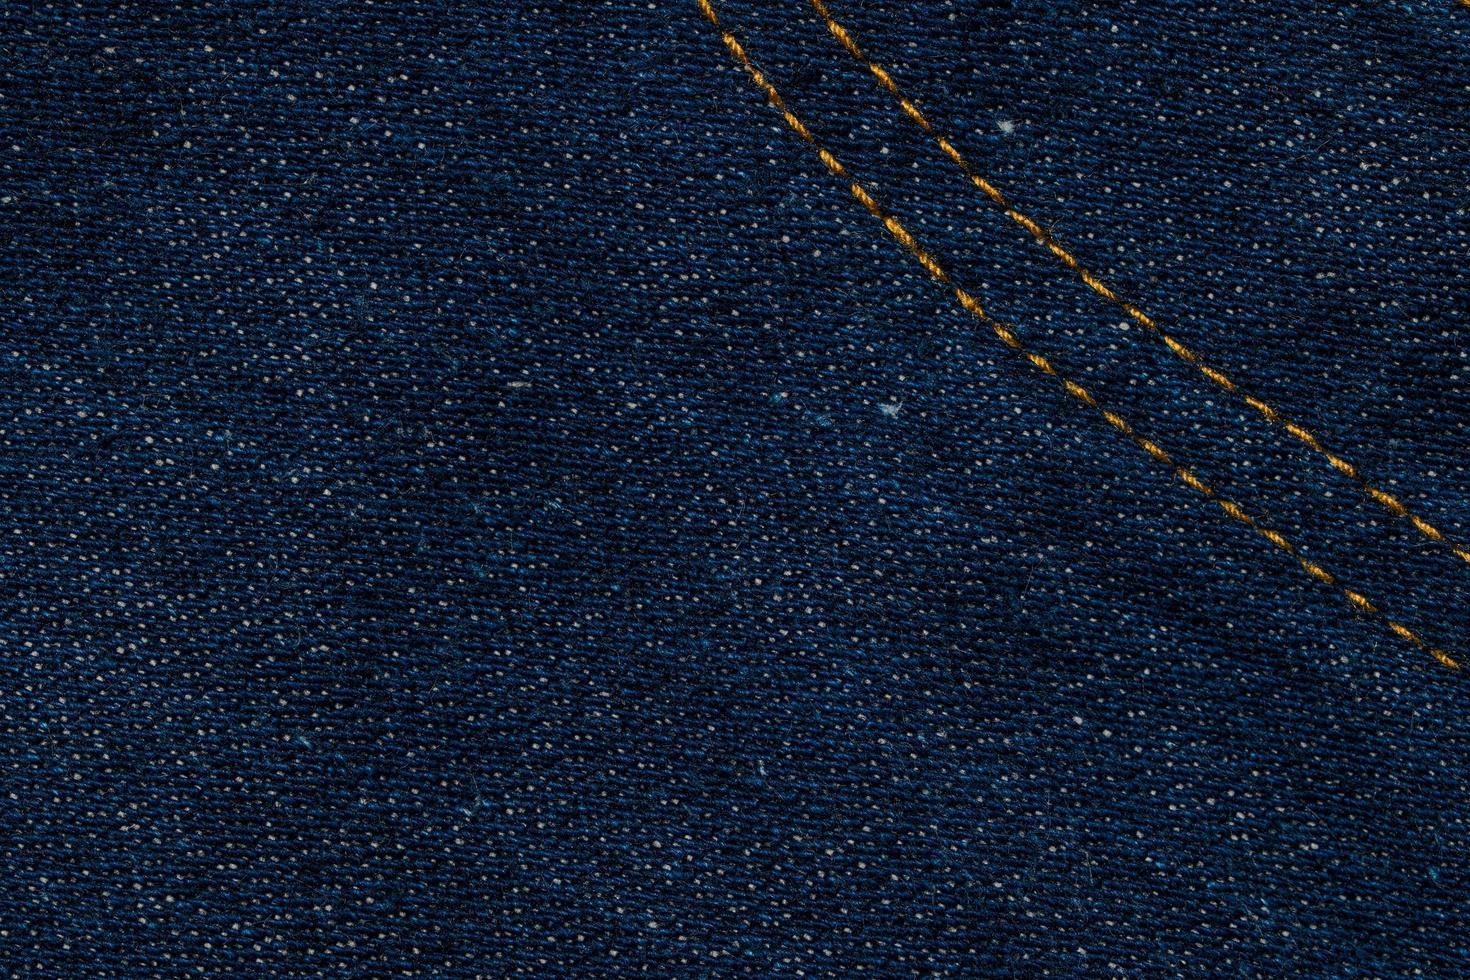 primer plano de la tela de jeans foto